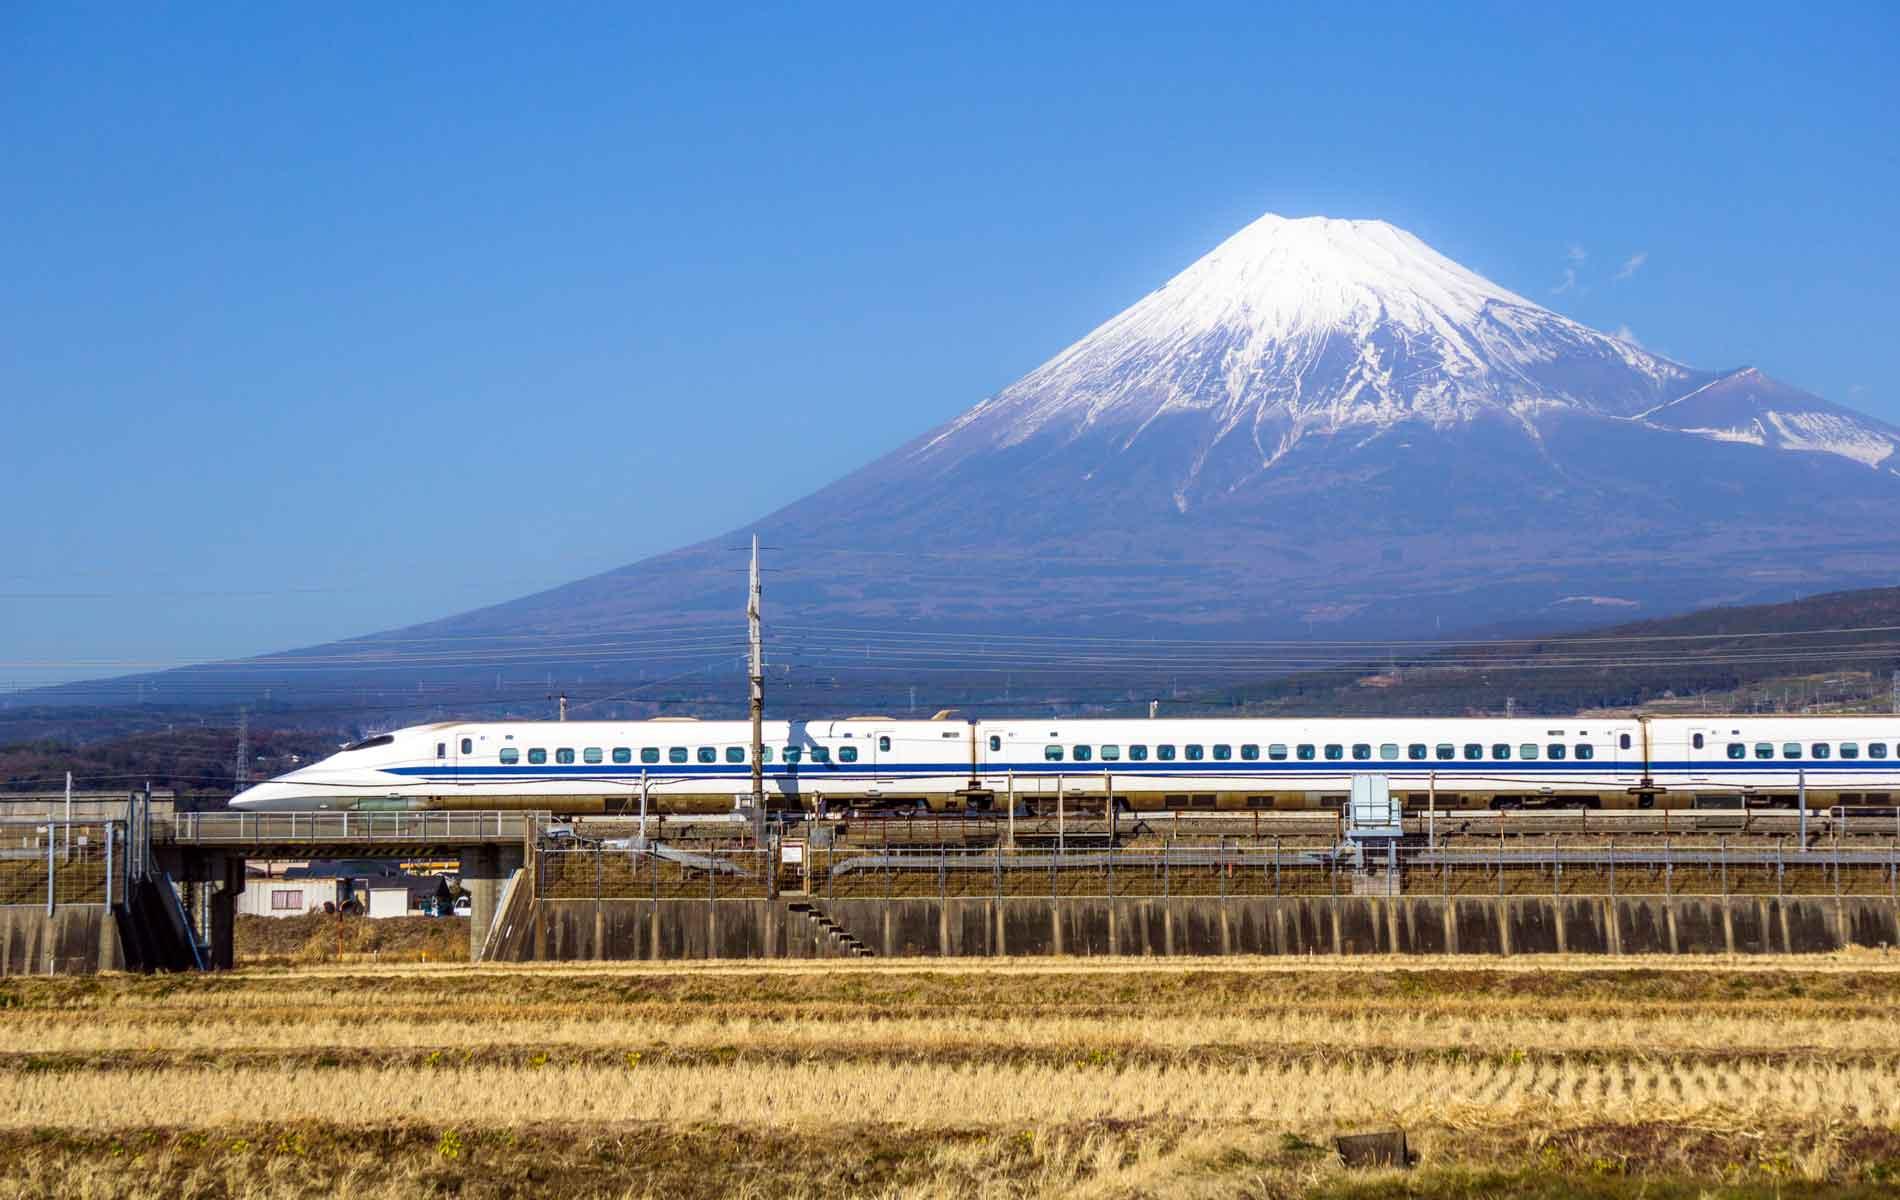 A Japanese bullet train passes Mount Fuji